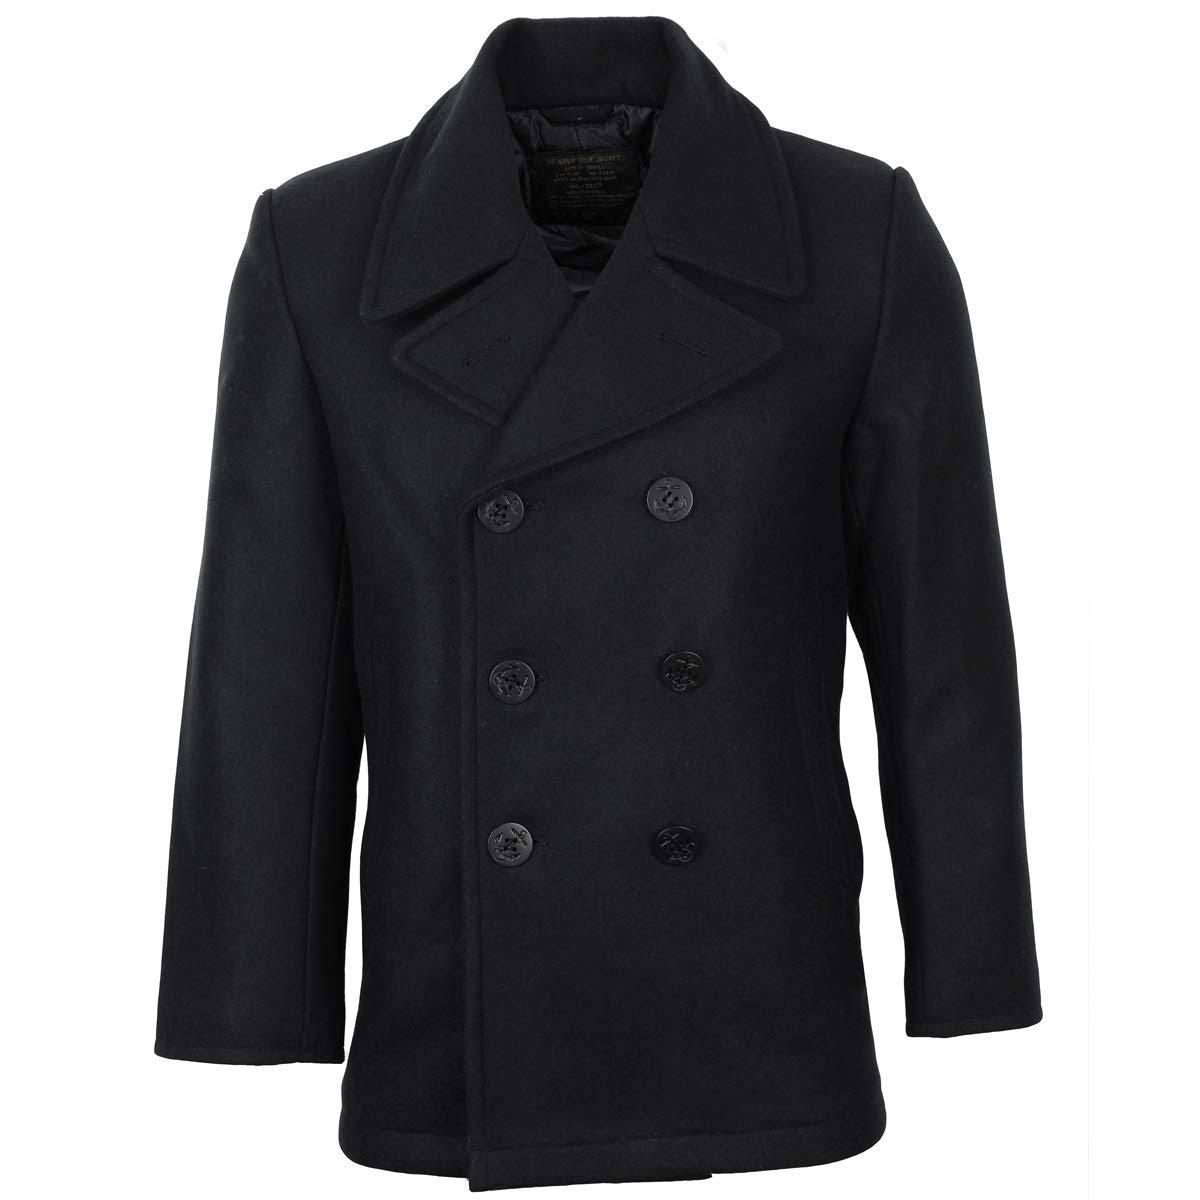 Mil Us Pea Navy M Schwarz Coat tec Größe tUtw5r